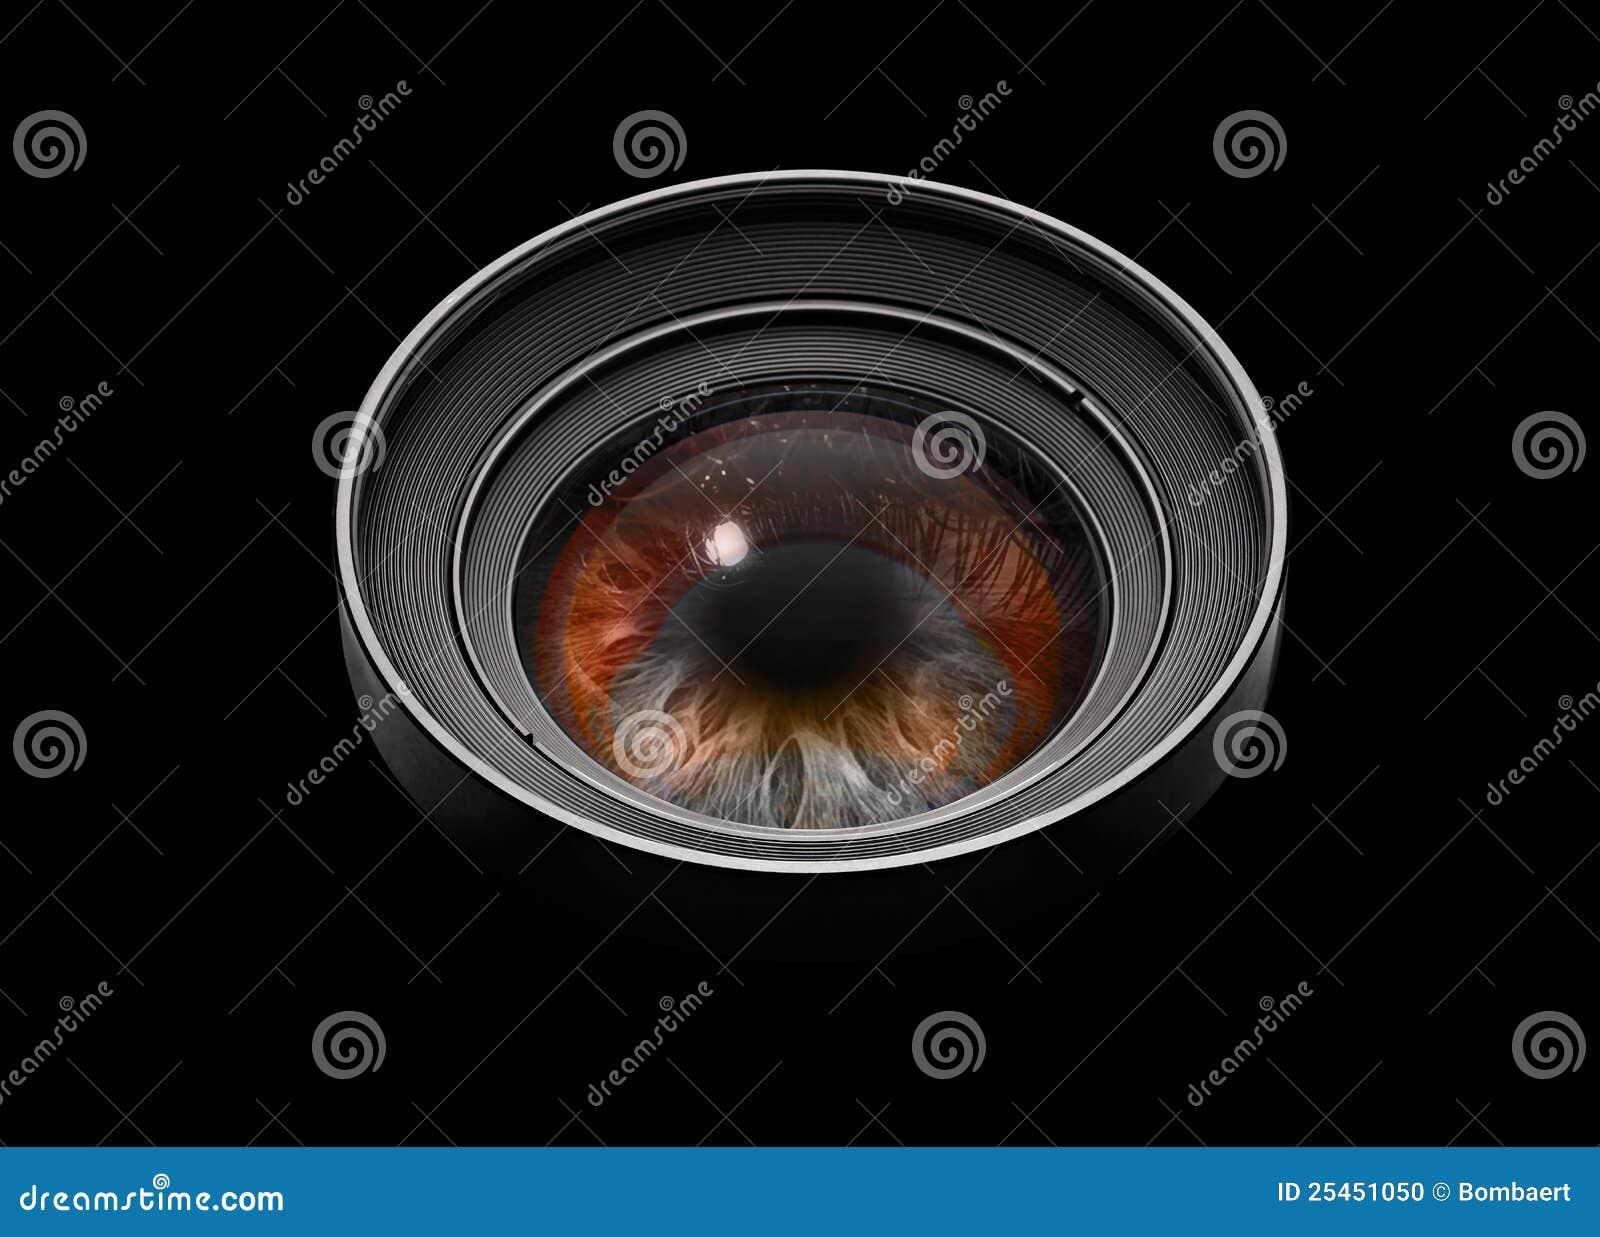 Black camera lens with eye